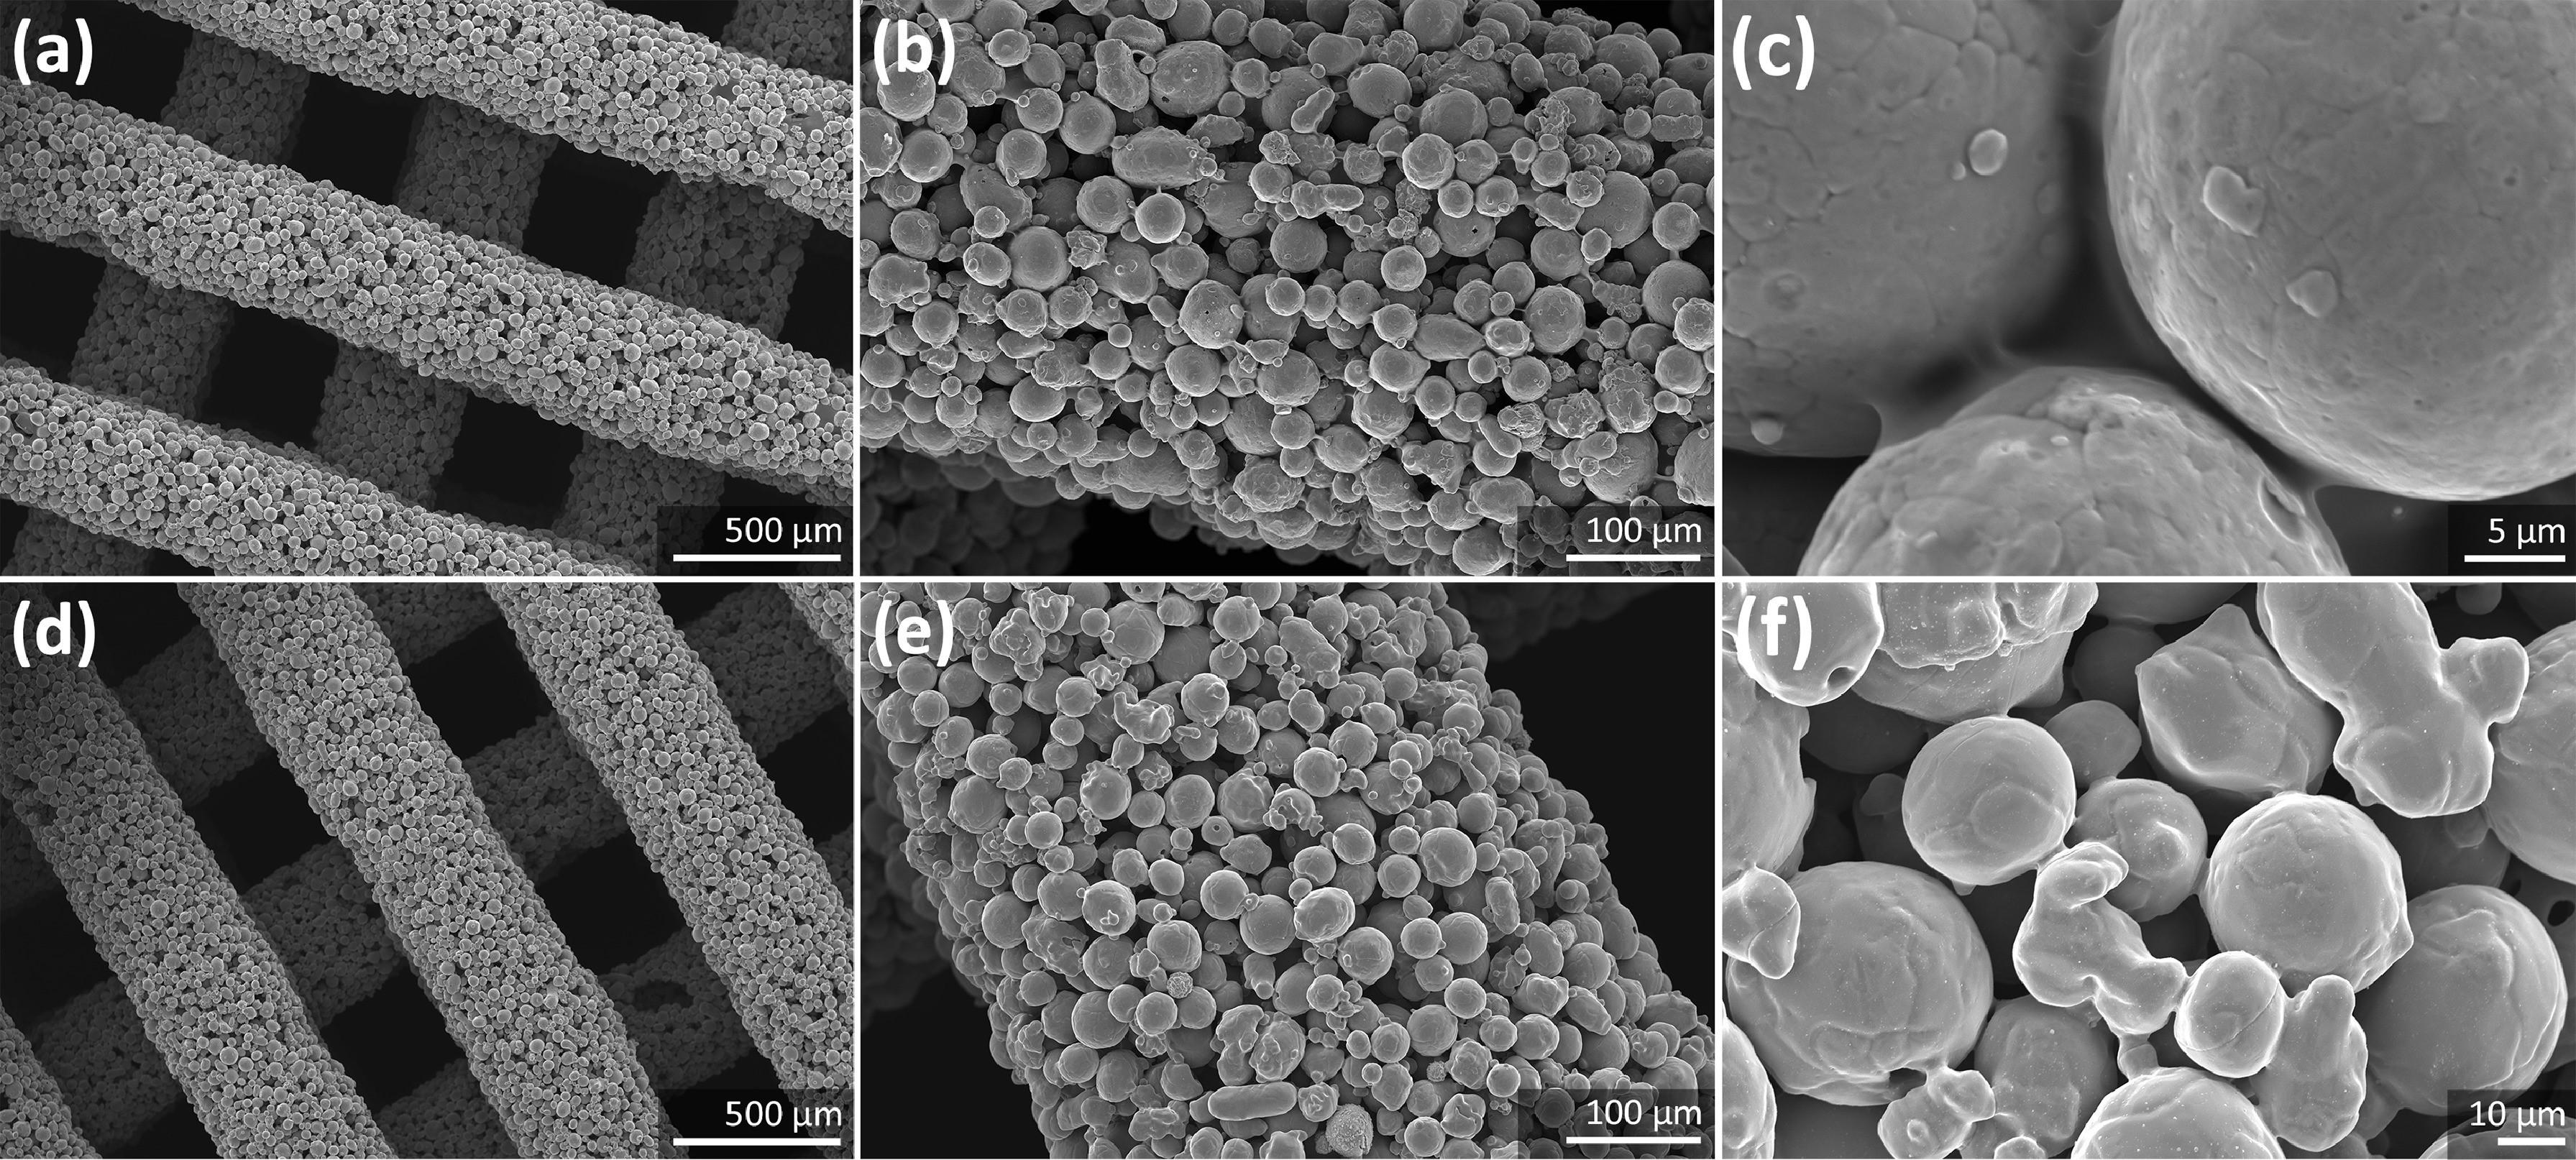 SEM imaging of the porous iron scaffolds. Image via TU Delft.